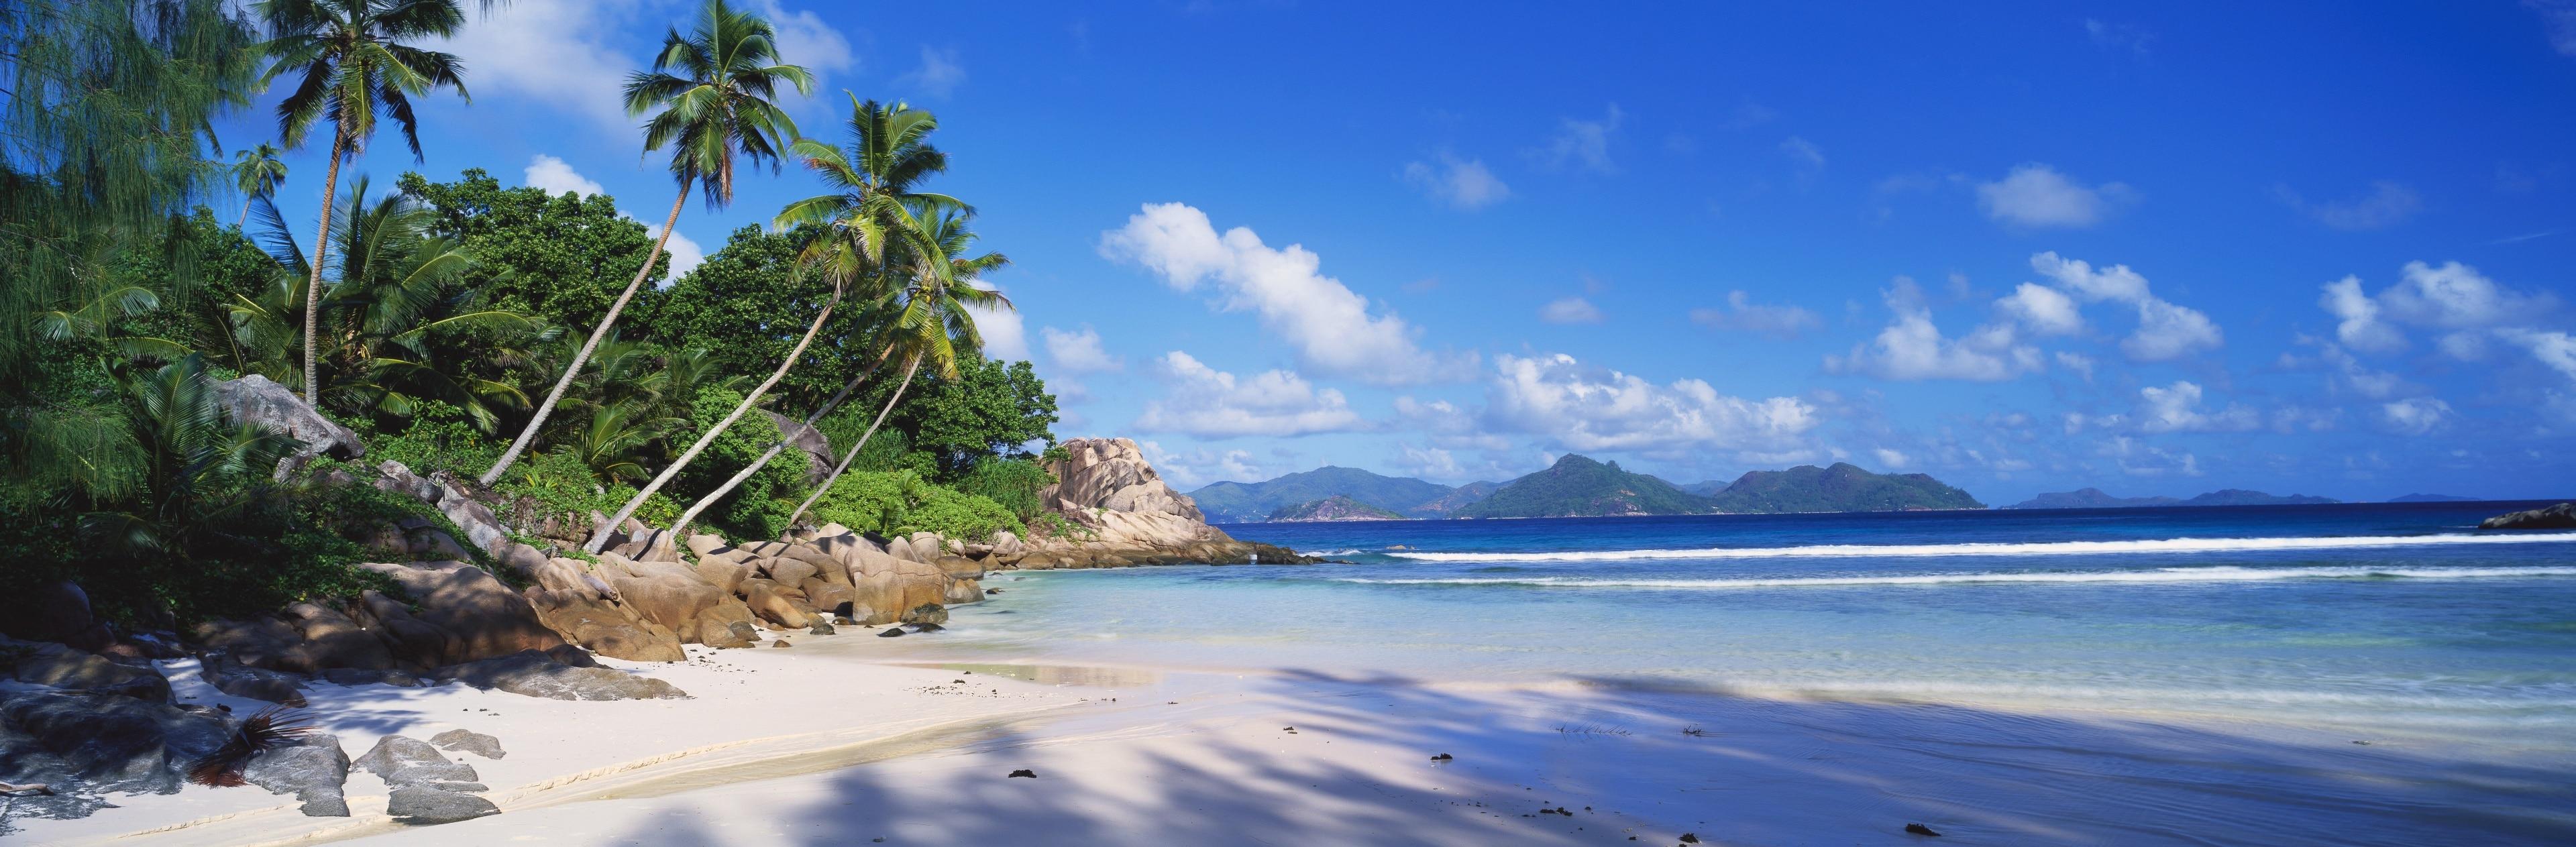 Grand'Anse Praslin, Praslin Island, Seychelles